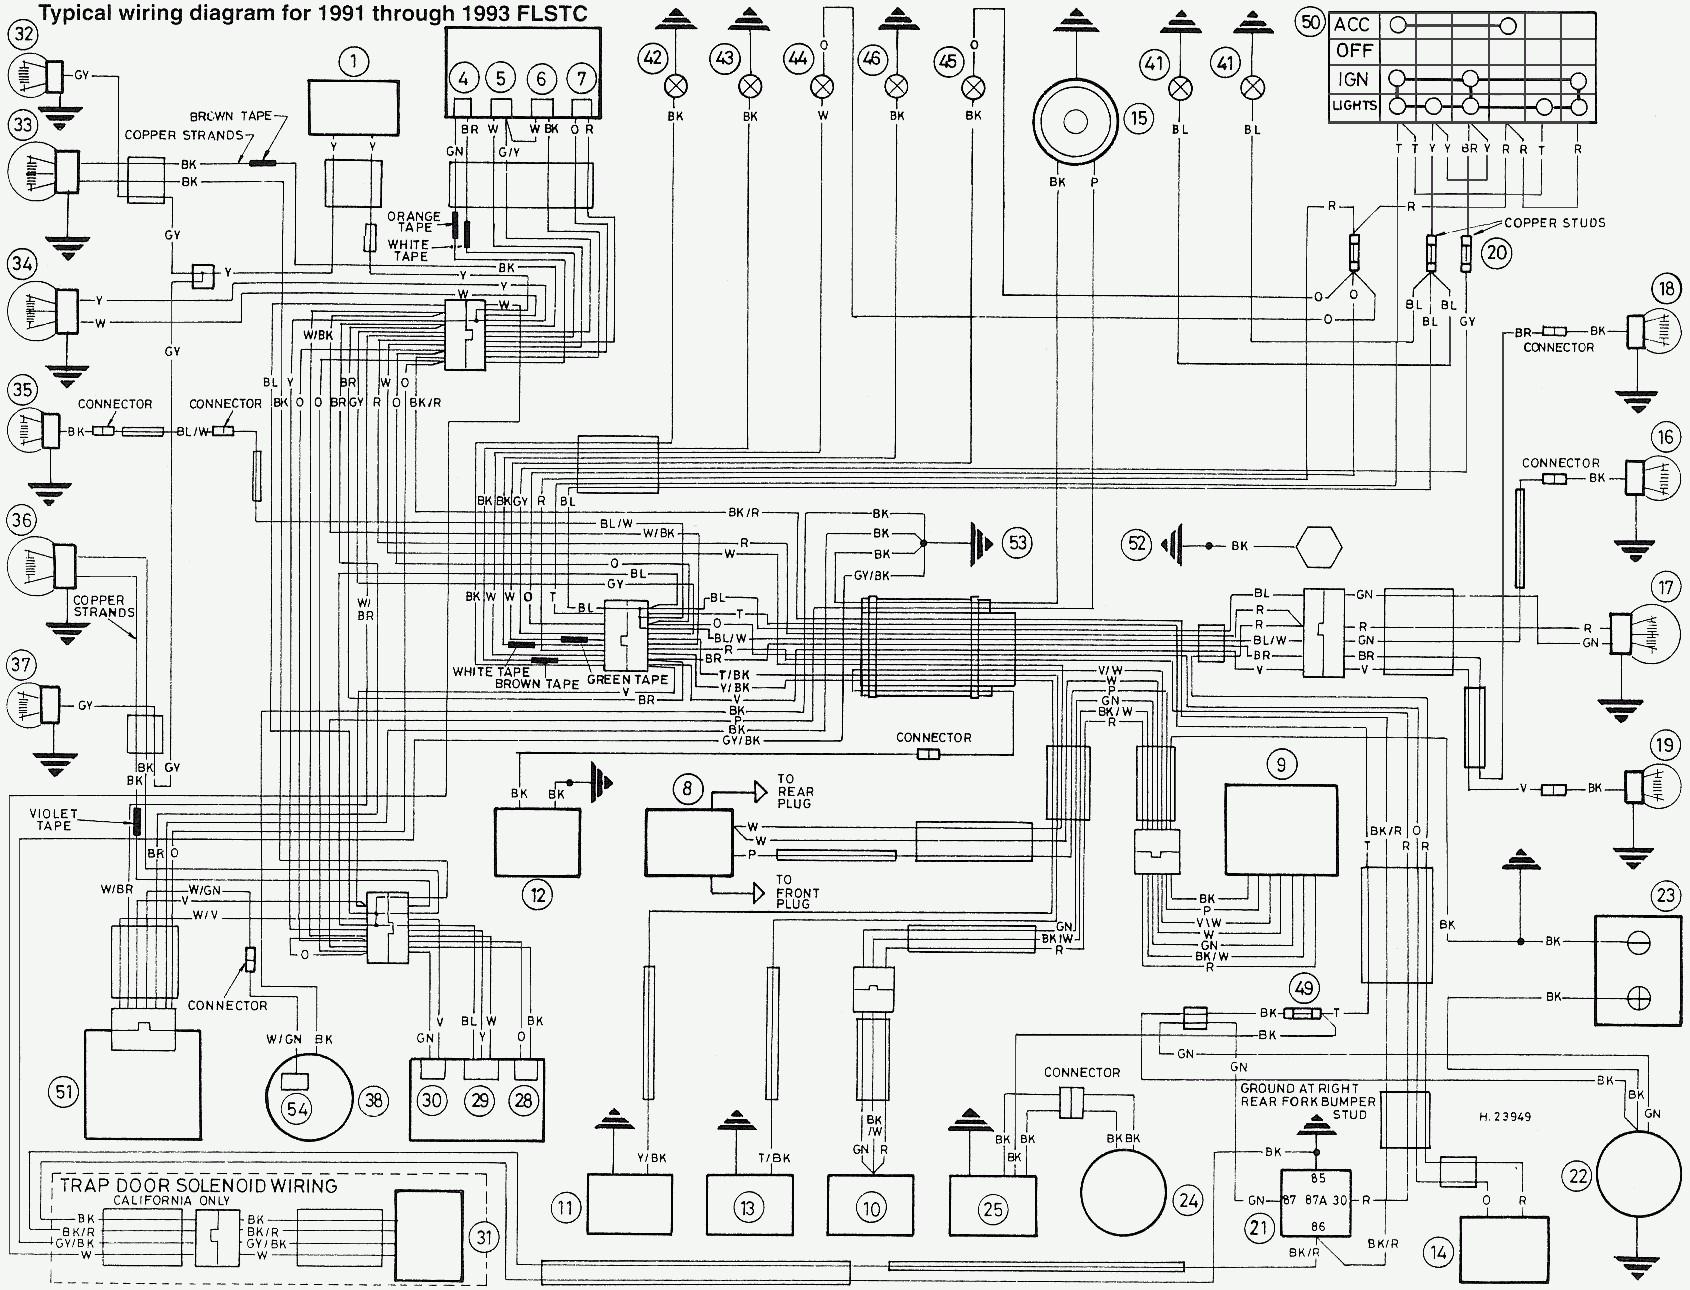 2006 Road King Wiring Diagram - Wiring Diagram  Electra Glide Wiring Diagram on